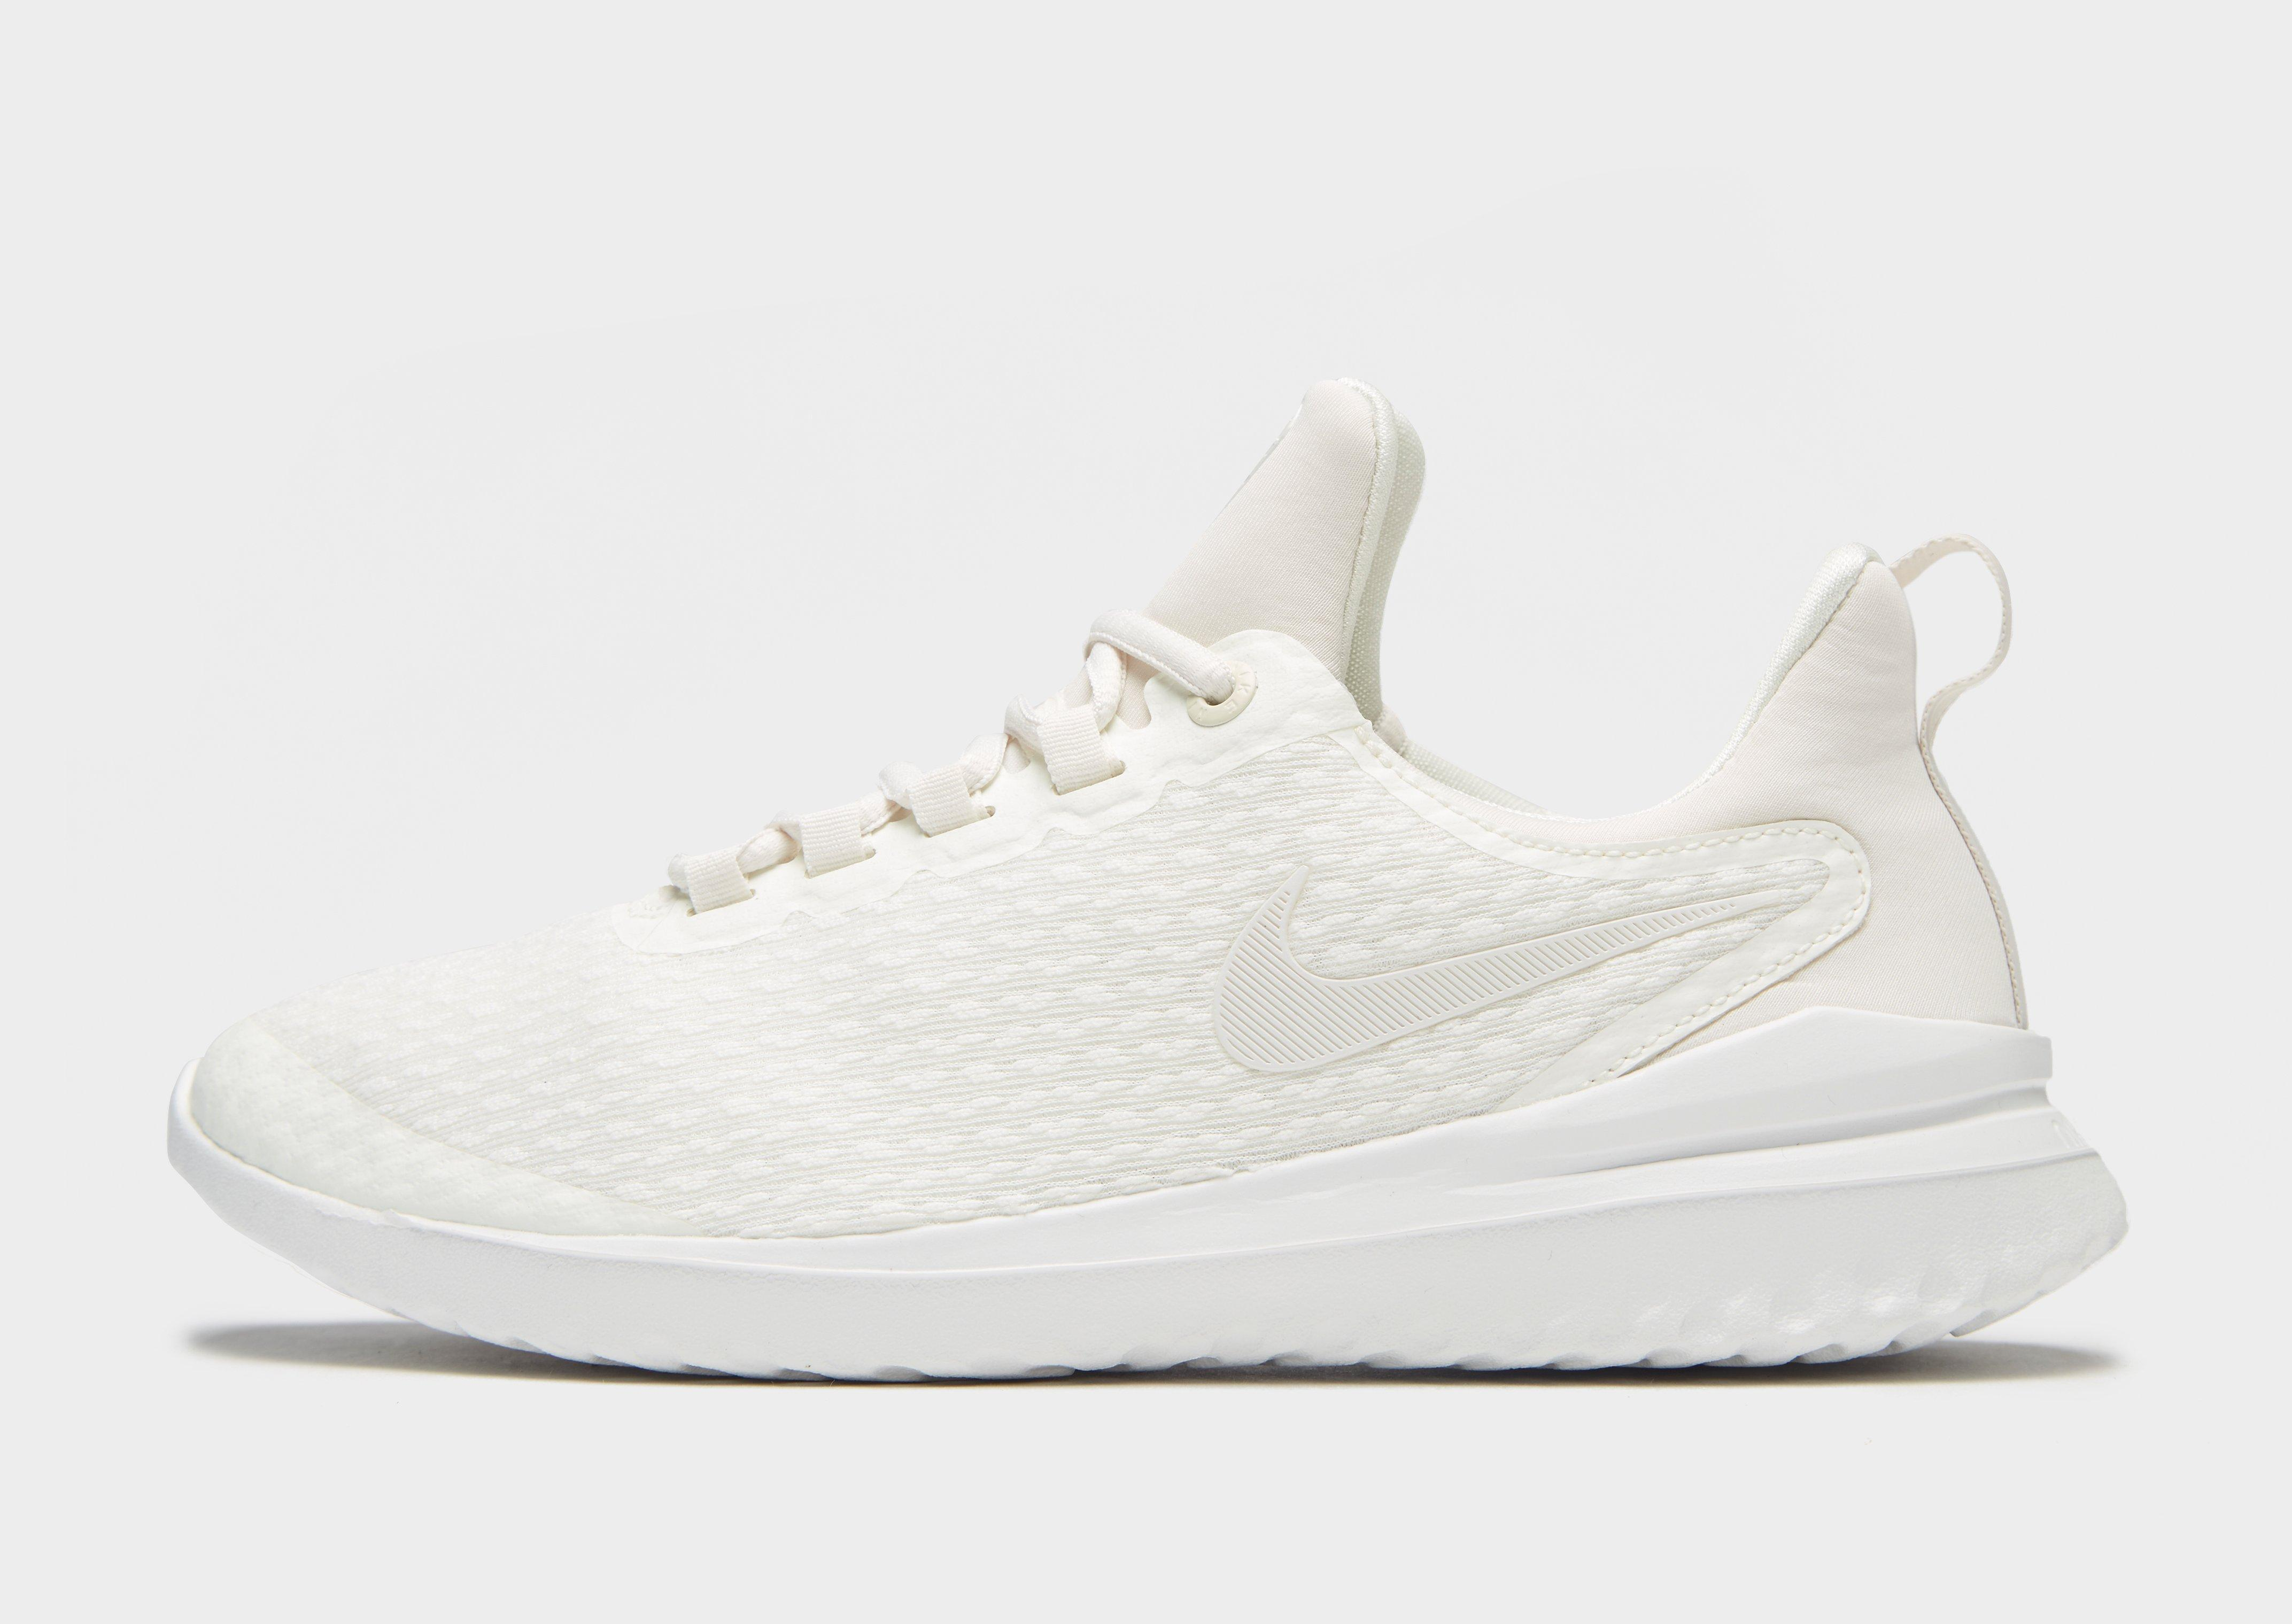 Lyst Nike Renew Rival in bianca